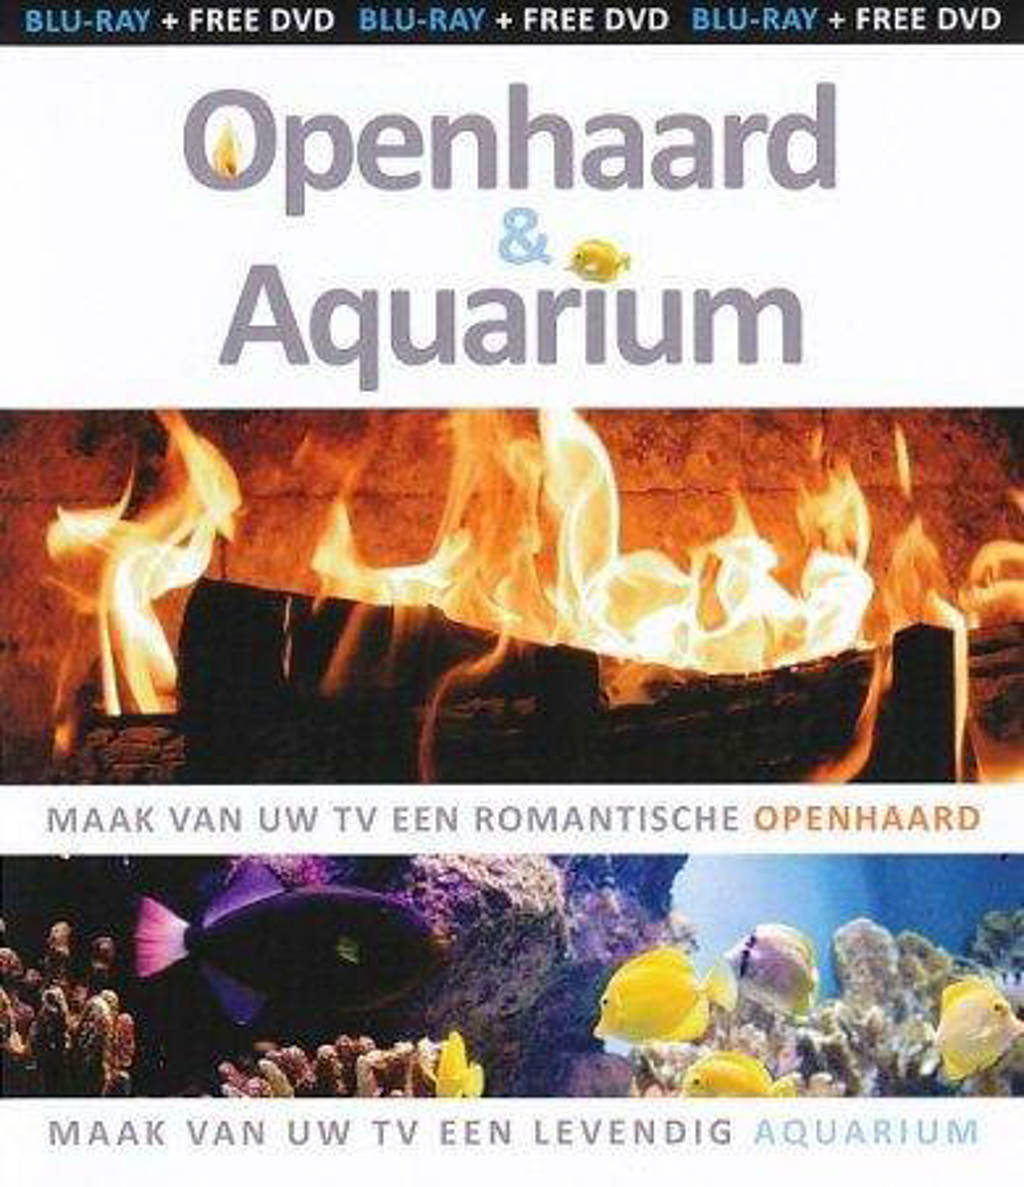 Openhaard & Aquarium (Blu-ray)